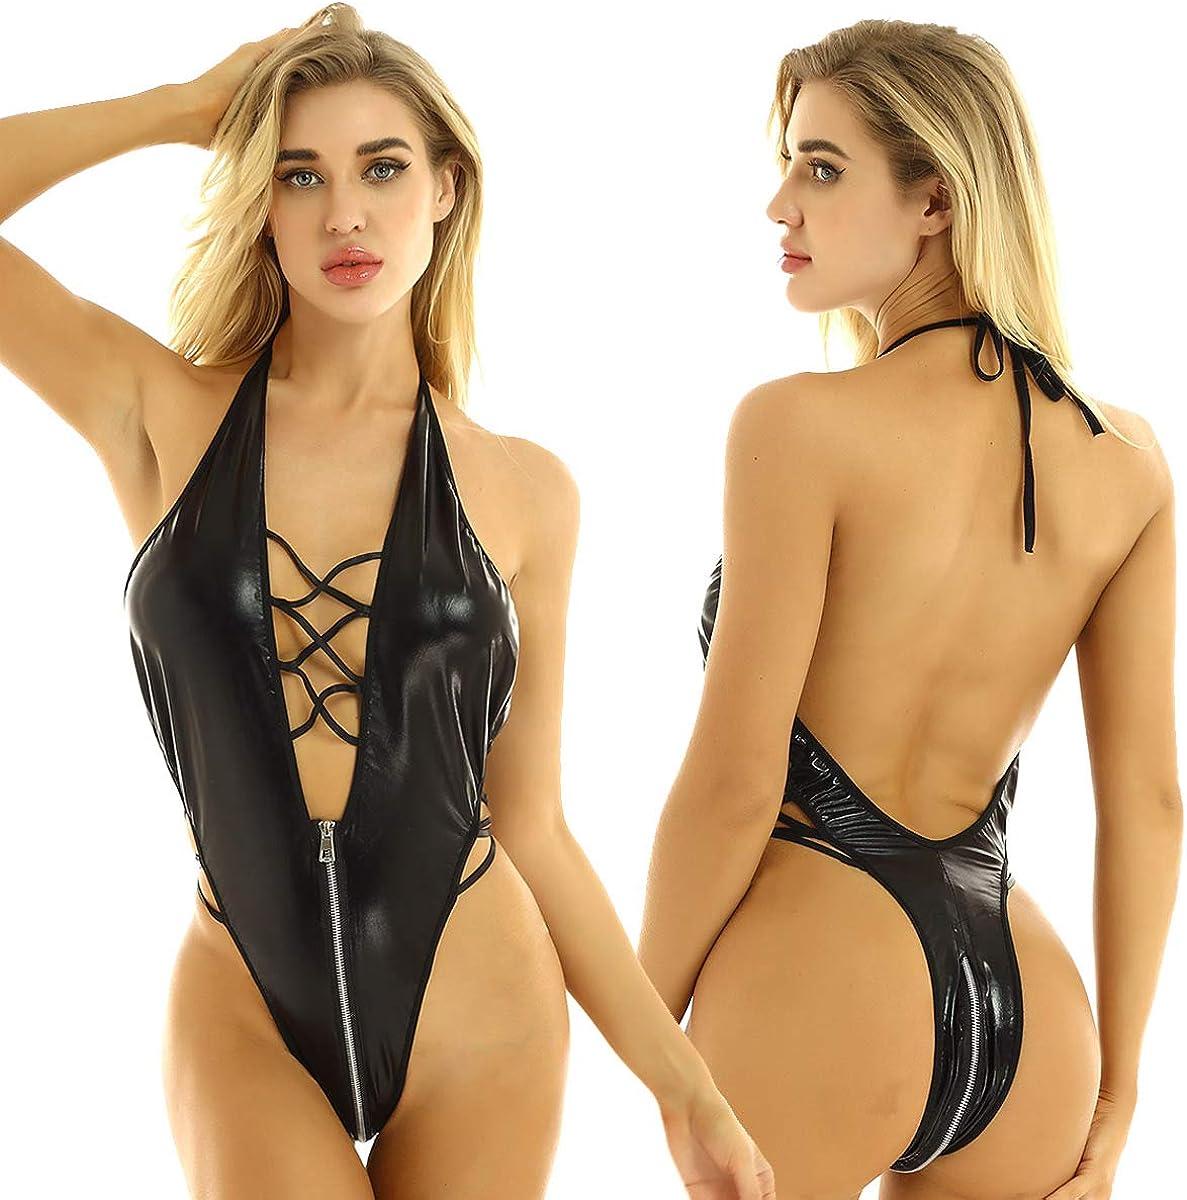 CHICTRY Womens Wet Look Long Sleeves Zipped Bodysuit Faux Leather Party Dress Lingerie Clubwear